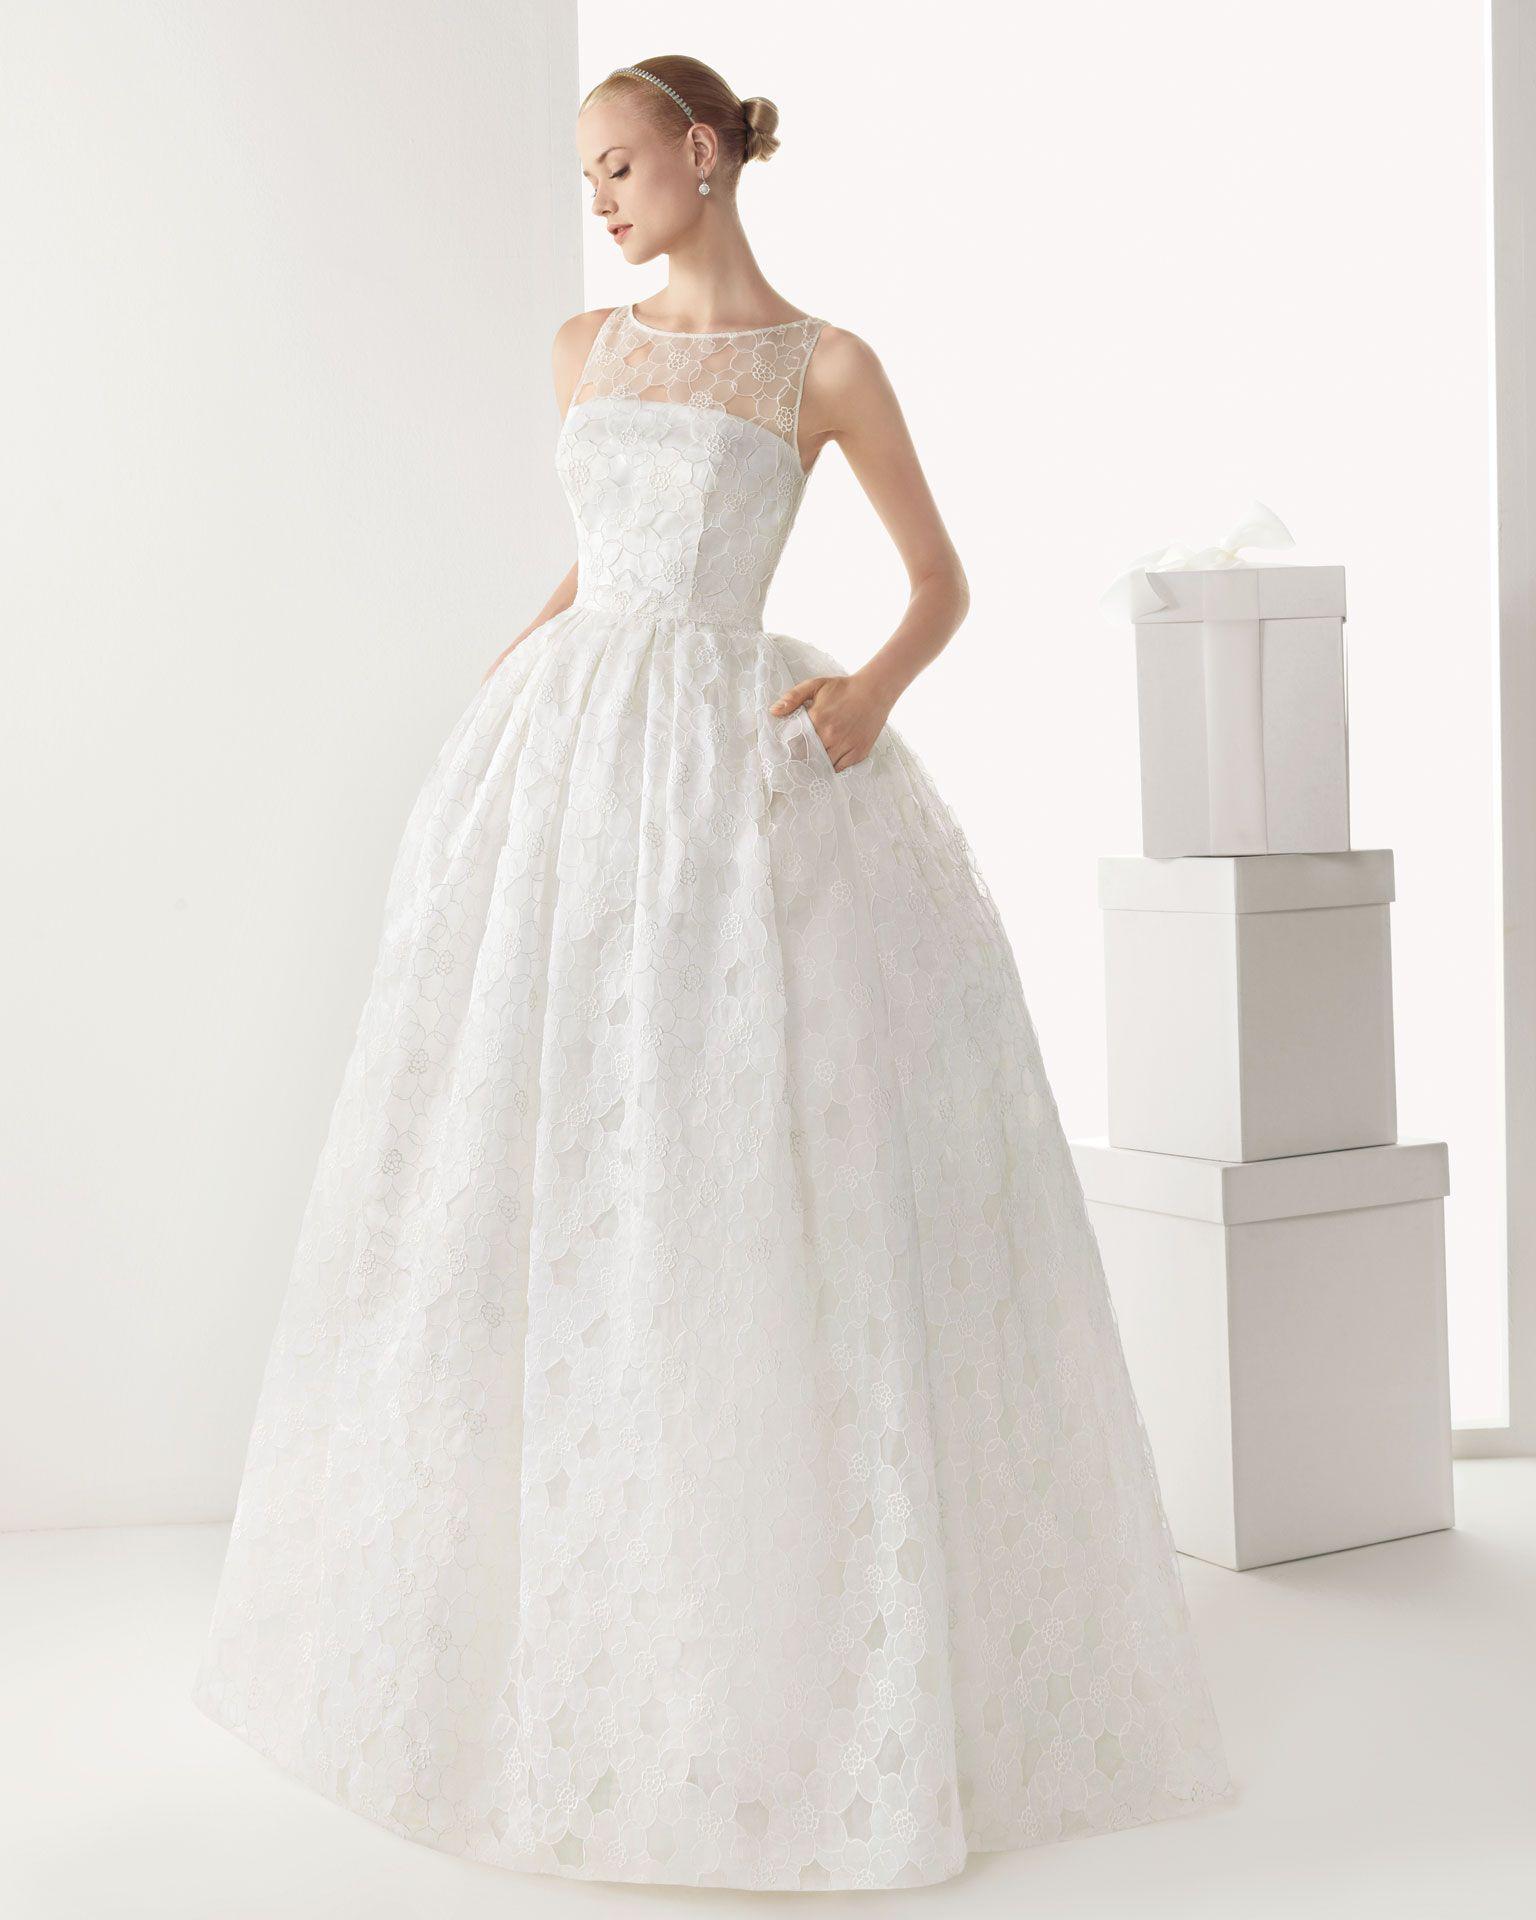 1950s style wedding dresses  Winter Wedding Inspiration  wedding stuff  Pinterest  Rosa clara